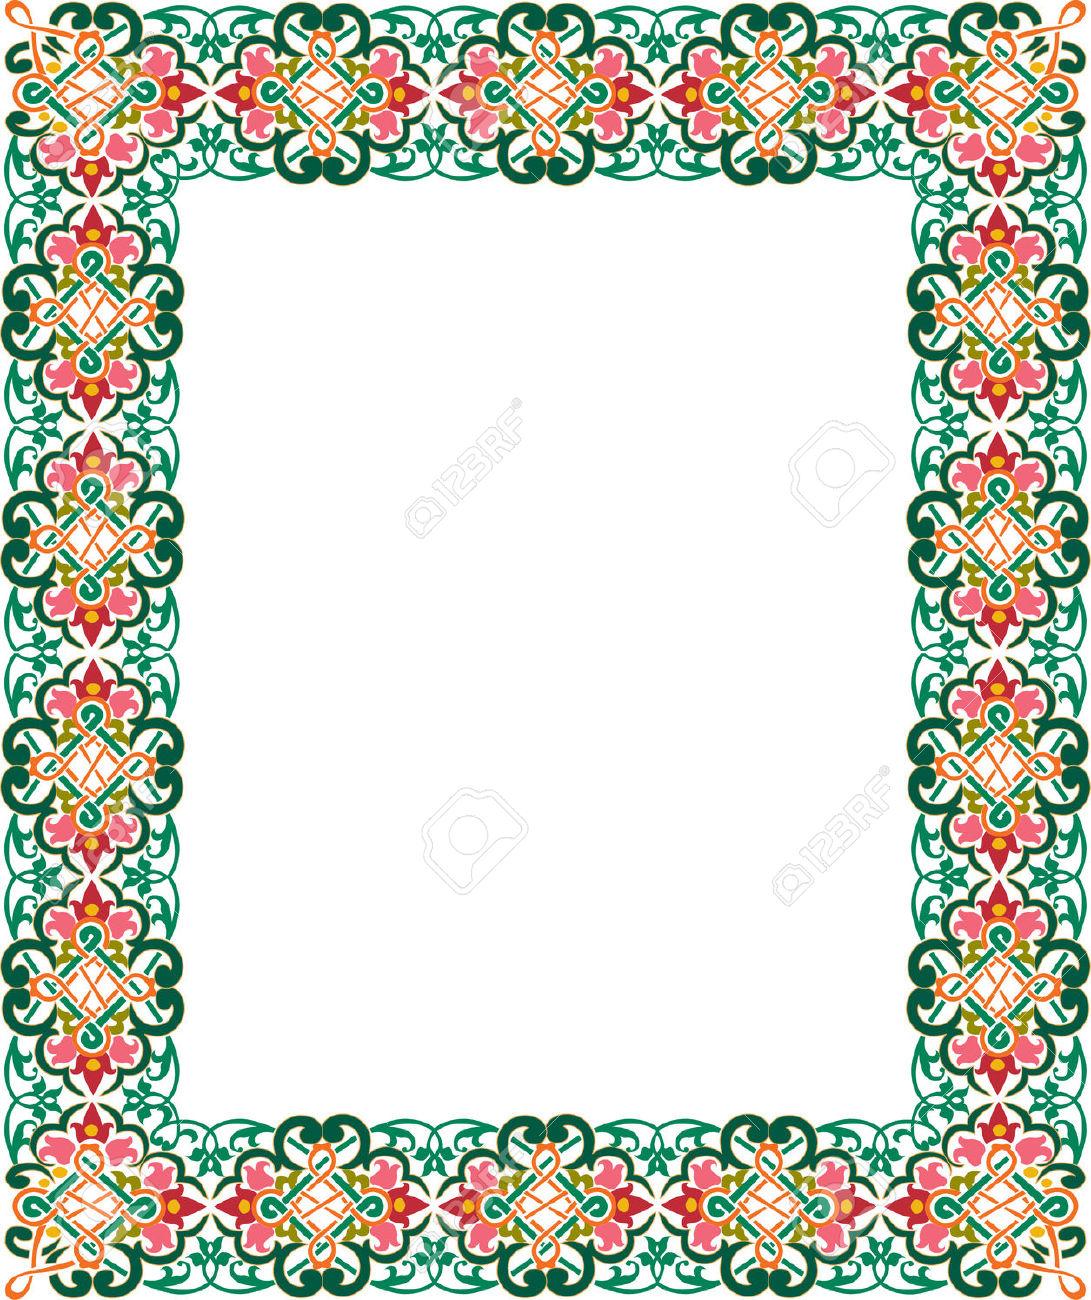 Frame clipart moroccan Clipart Moroccan Border Moroccan Clipart